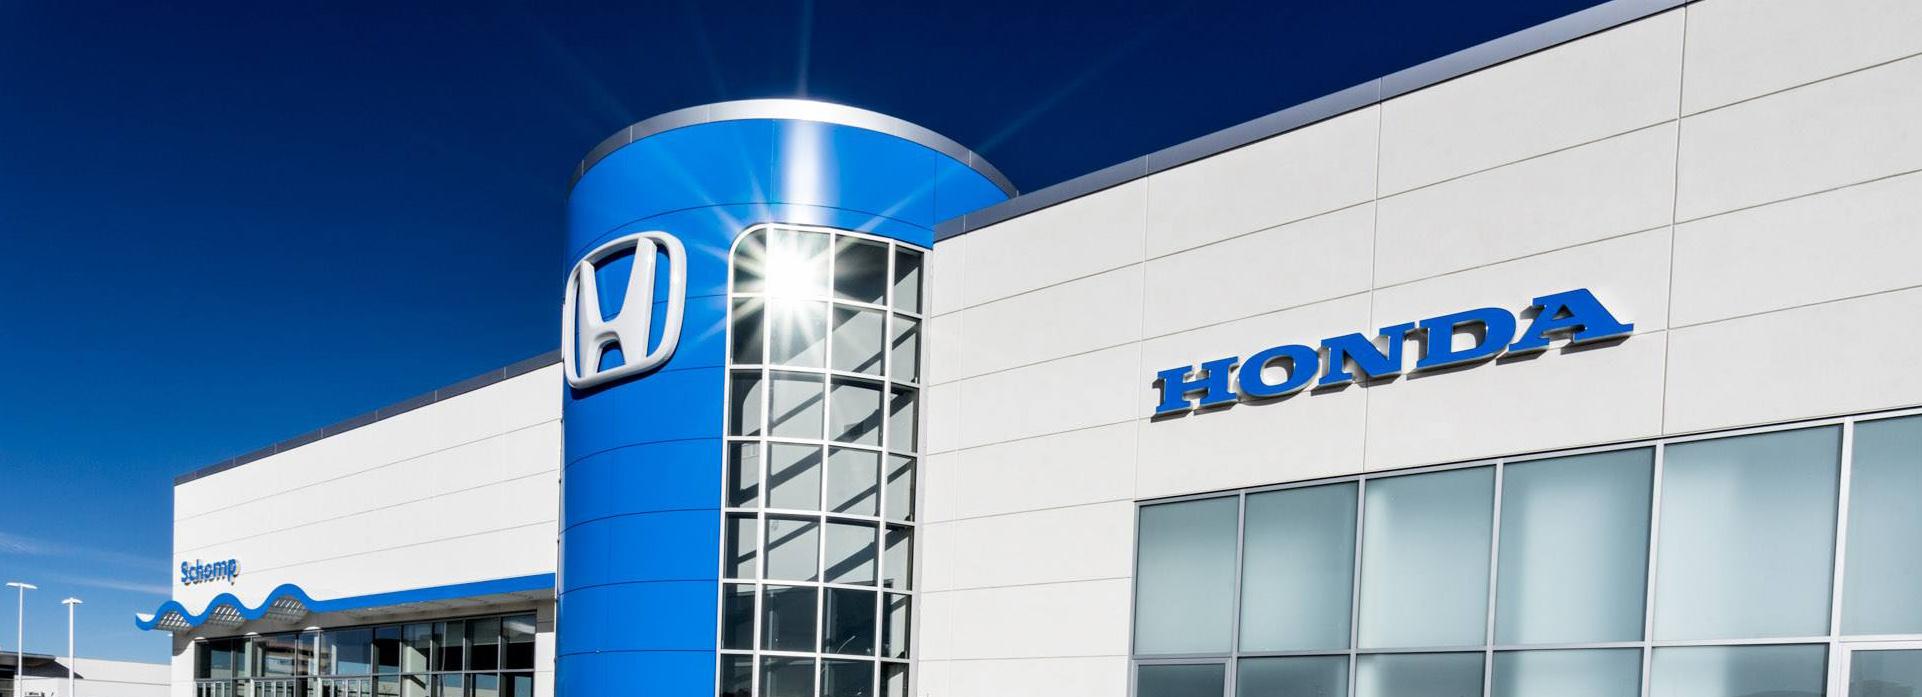 Schomp honda schomp automotive group for Honda dealer locations